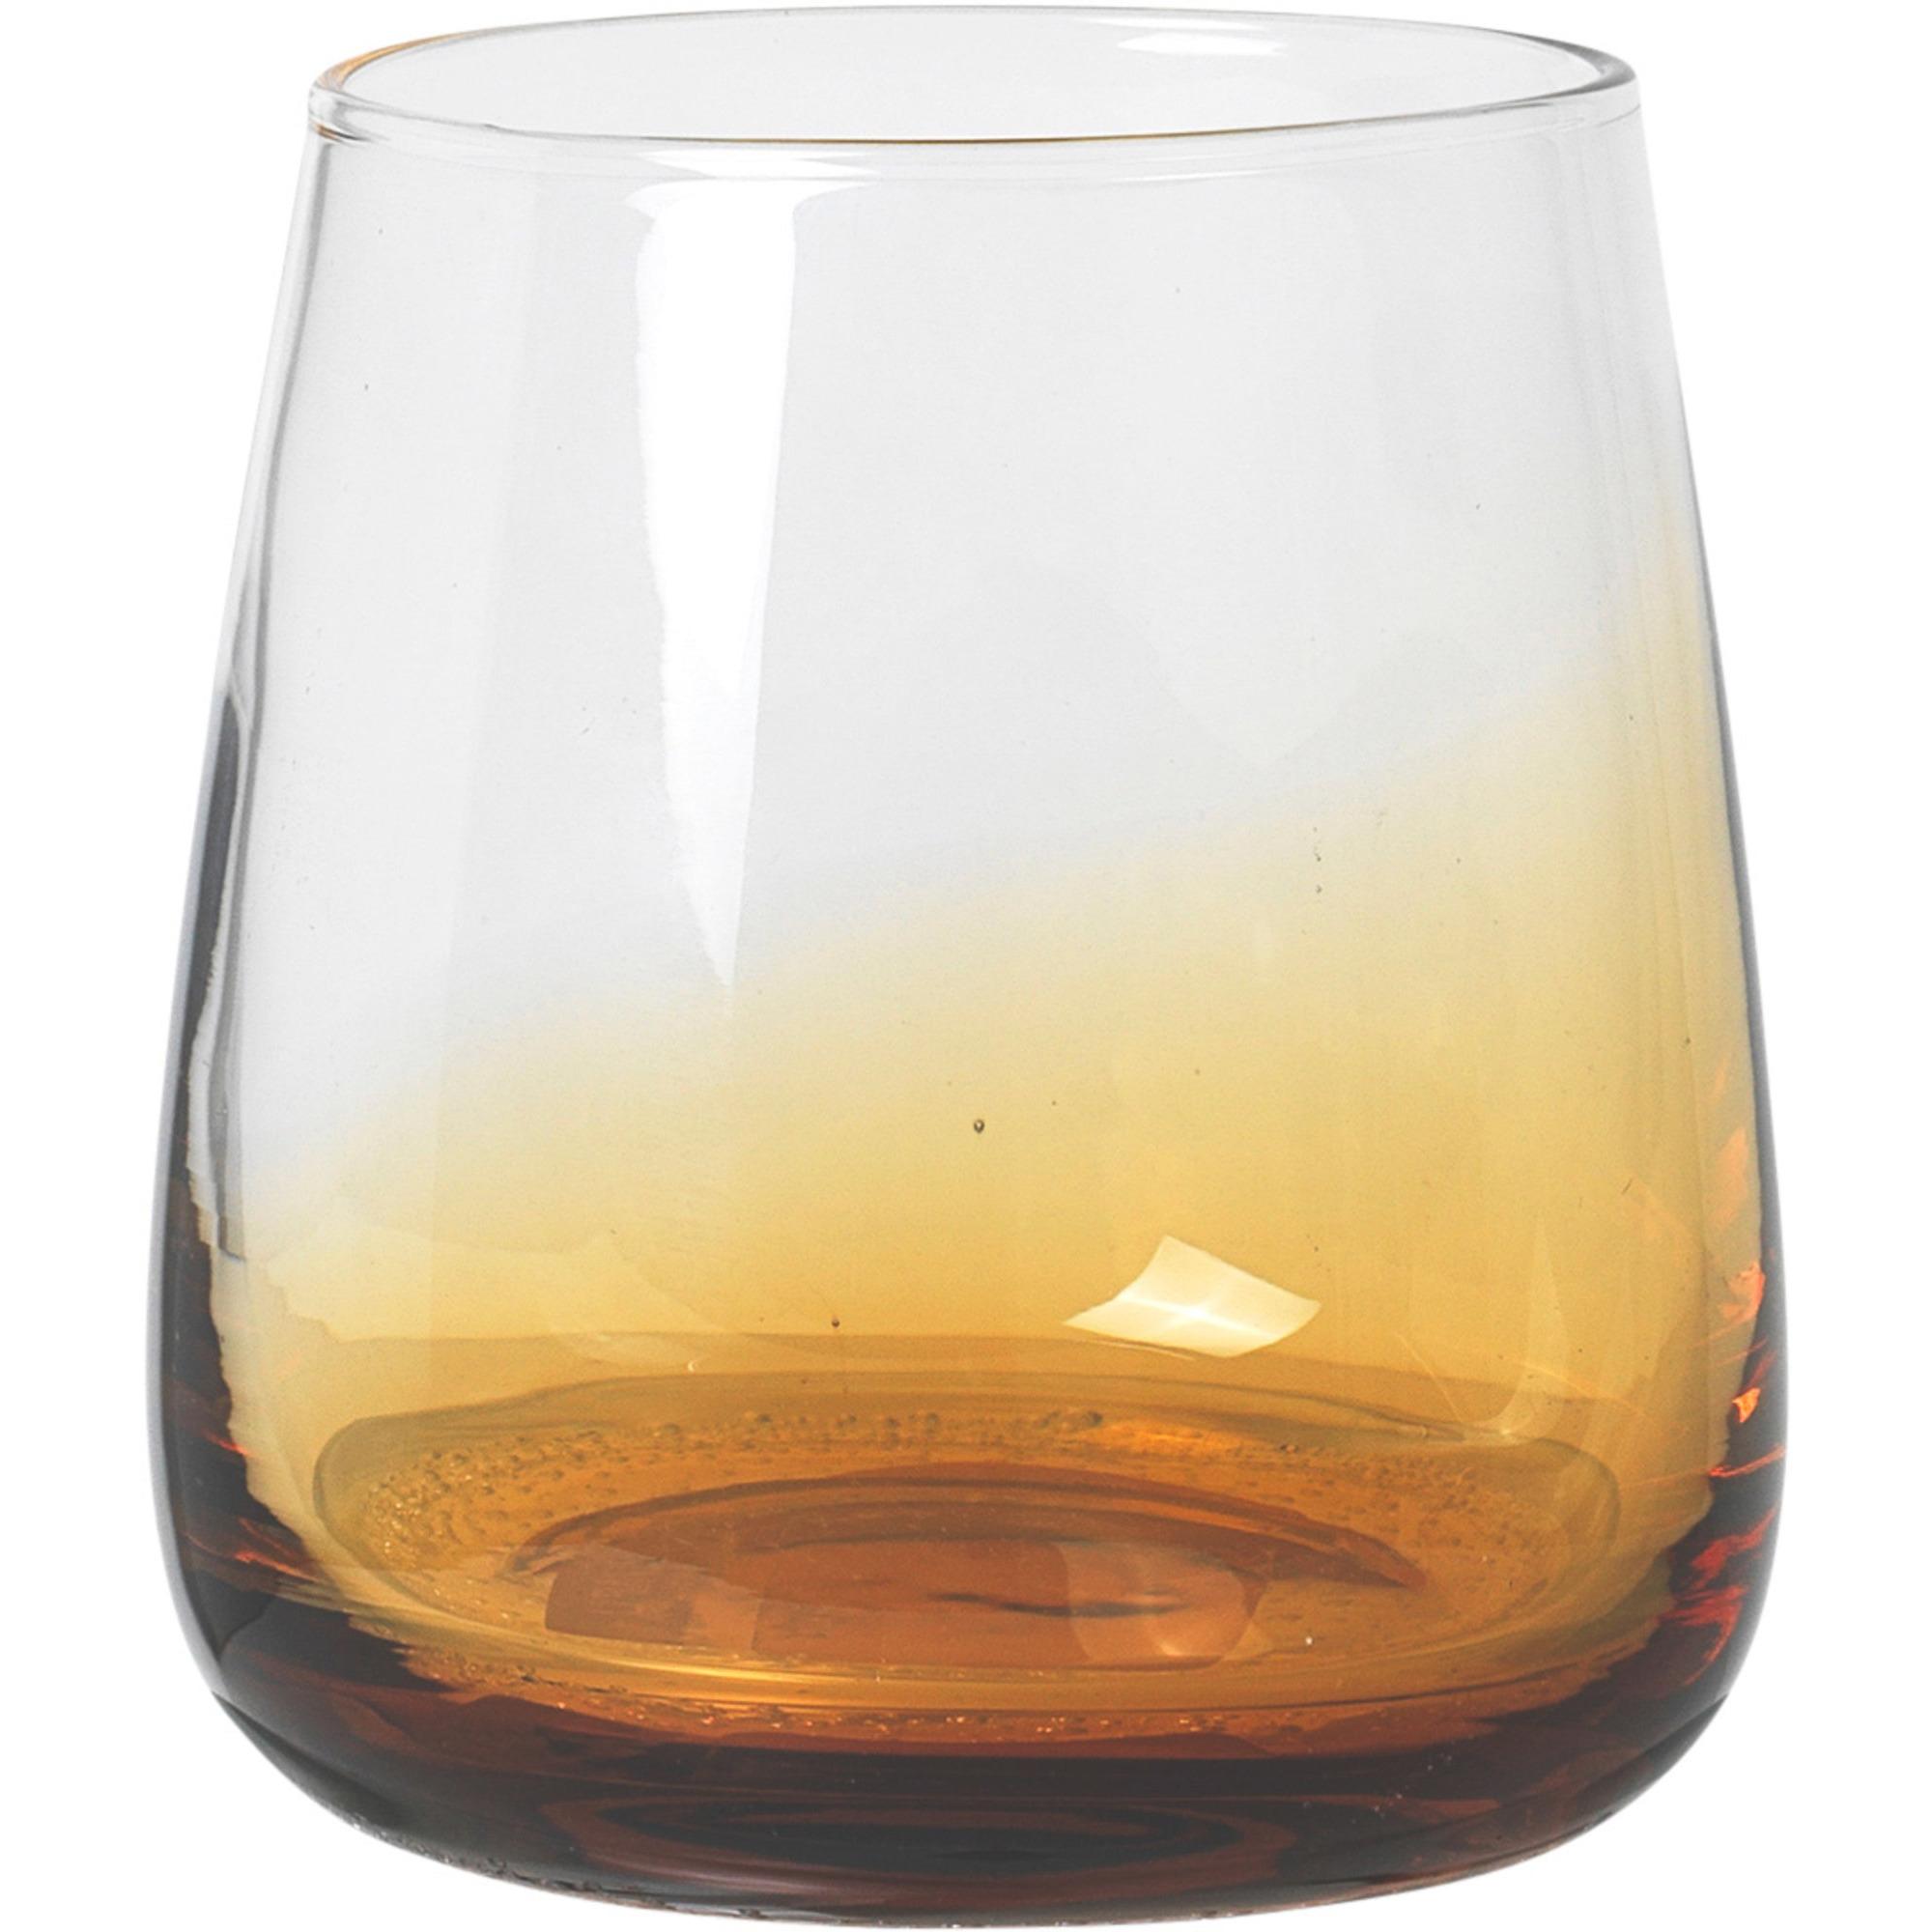 Broste Copenhagen 35 cl. Amber munblåst dricksglas